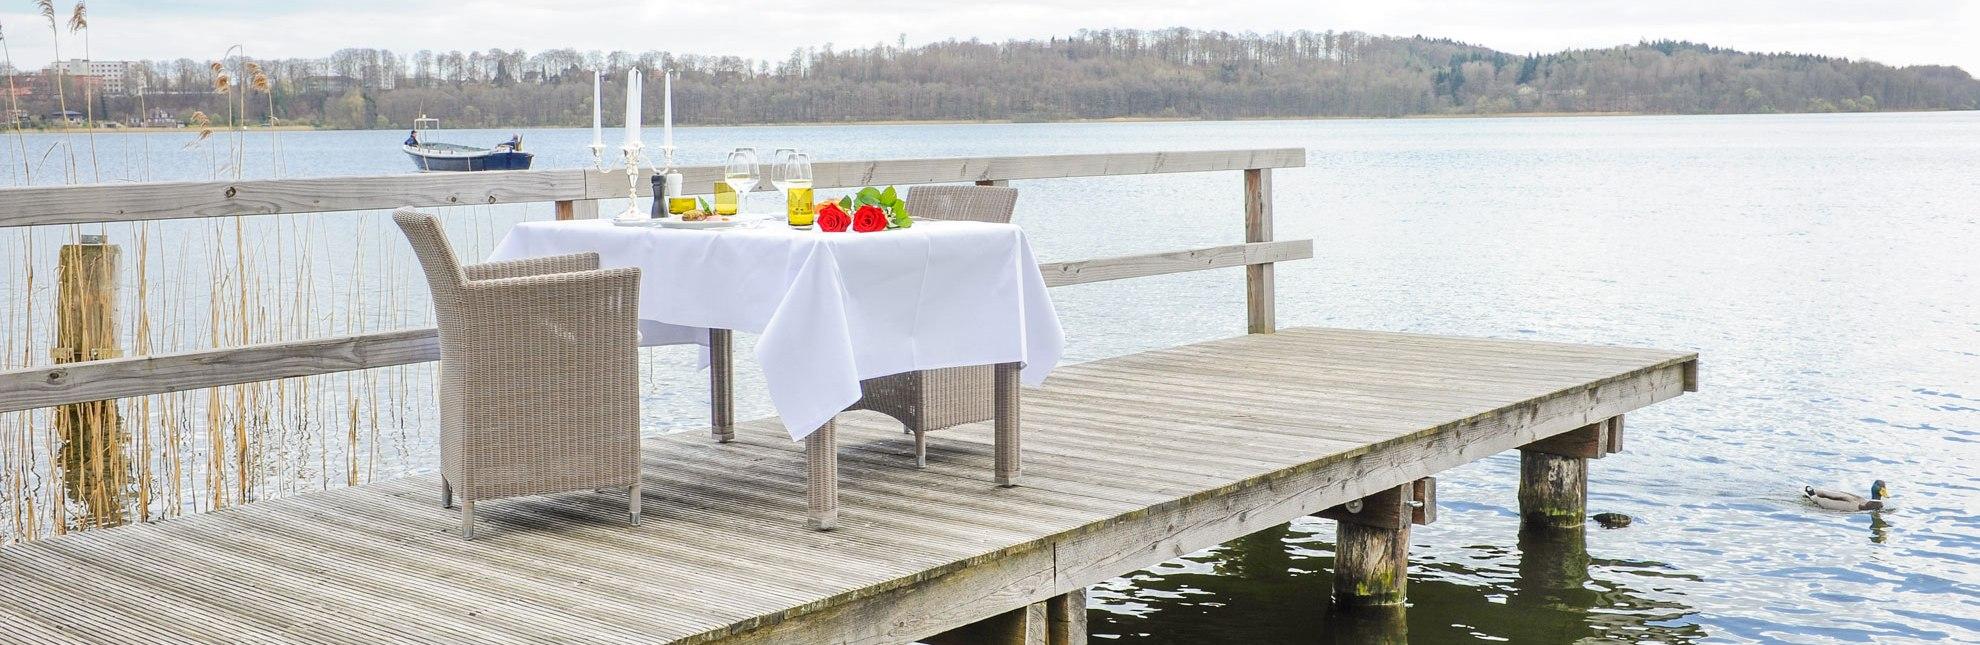 Dinner am See Hotel Der Seehof, © Nicole Franke/HLMS